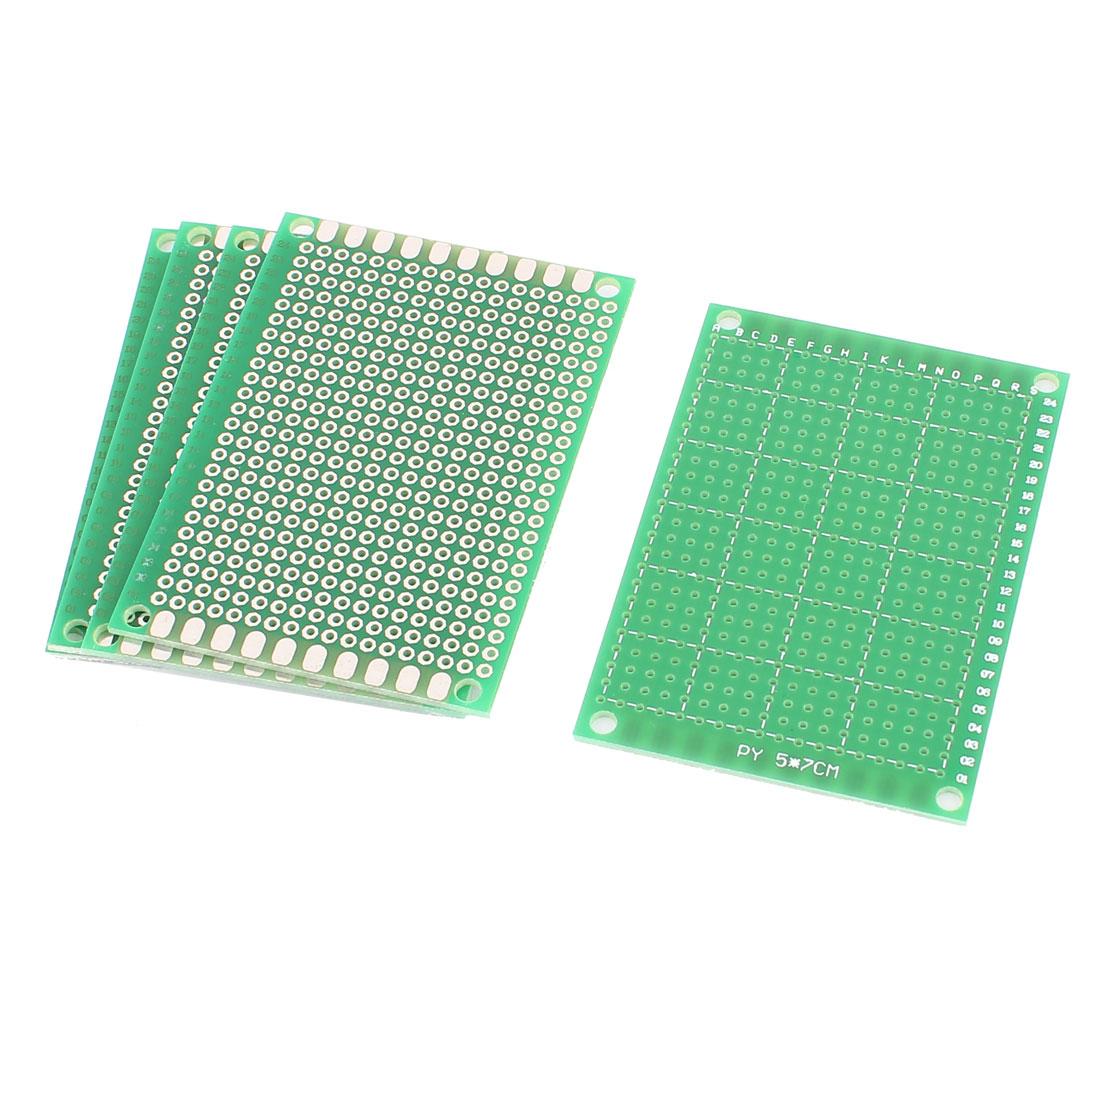 5 PCS 5cm x 7cm Green FR-4 One Side Prototypinge Paper DIY Universal PCB Print Circuit Board